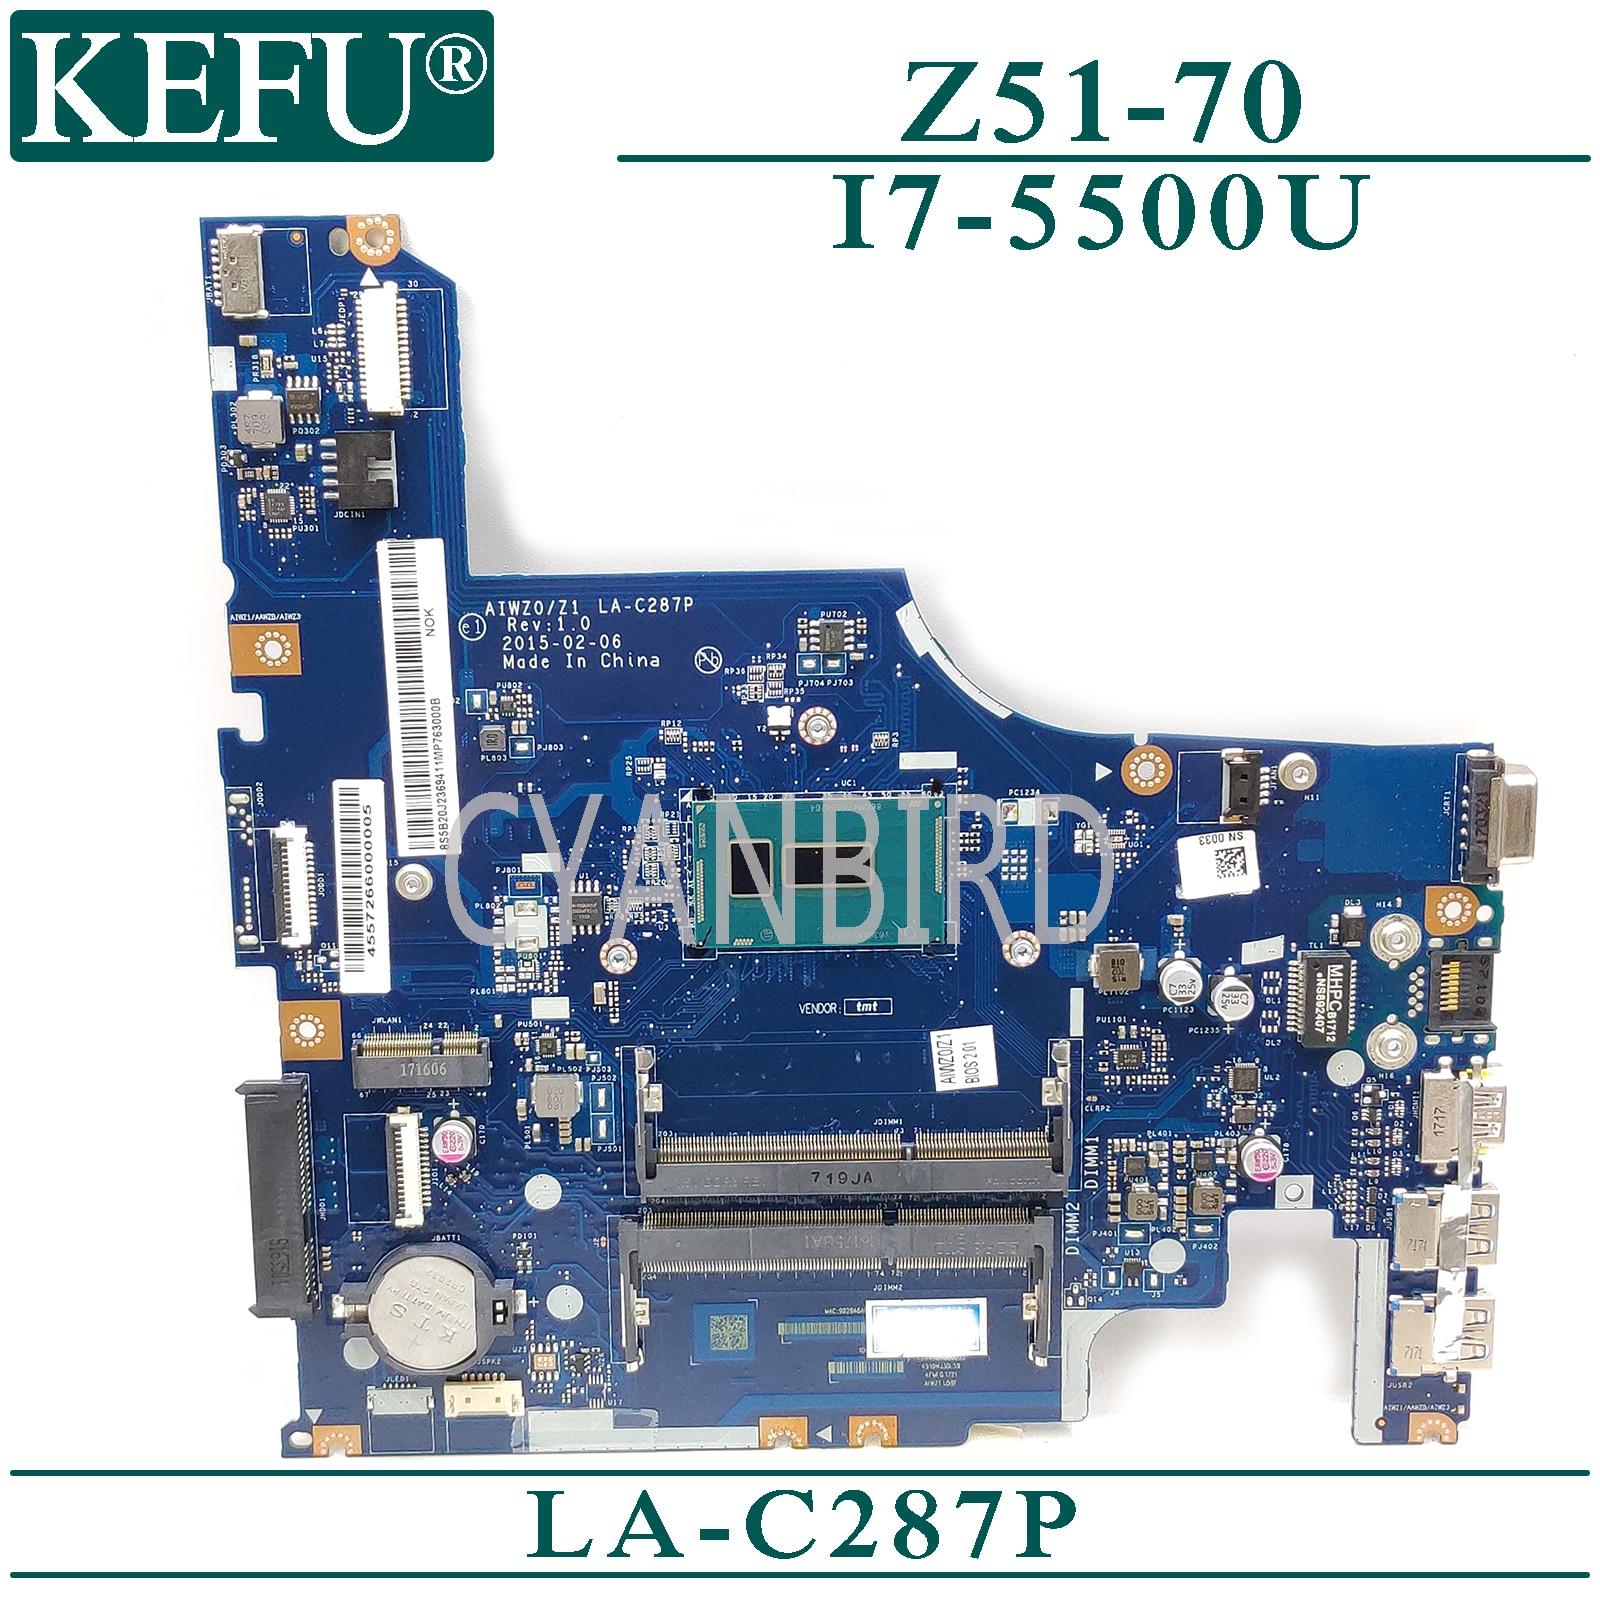 KEFU LA-C287P اللوحة الرئيسية الأصلية لينوفو Z51-70 مع I7-5500U اللوحة الأم للكمبيوتر المحمول